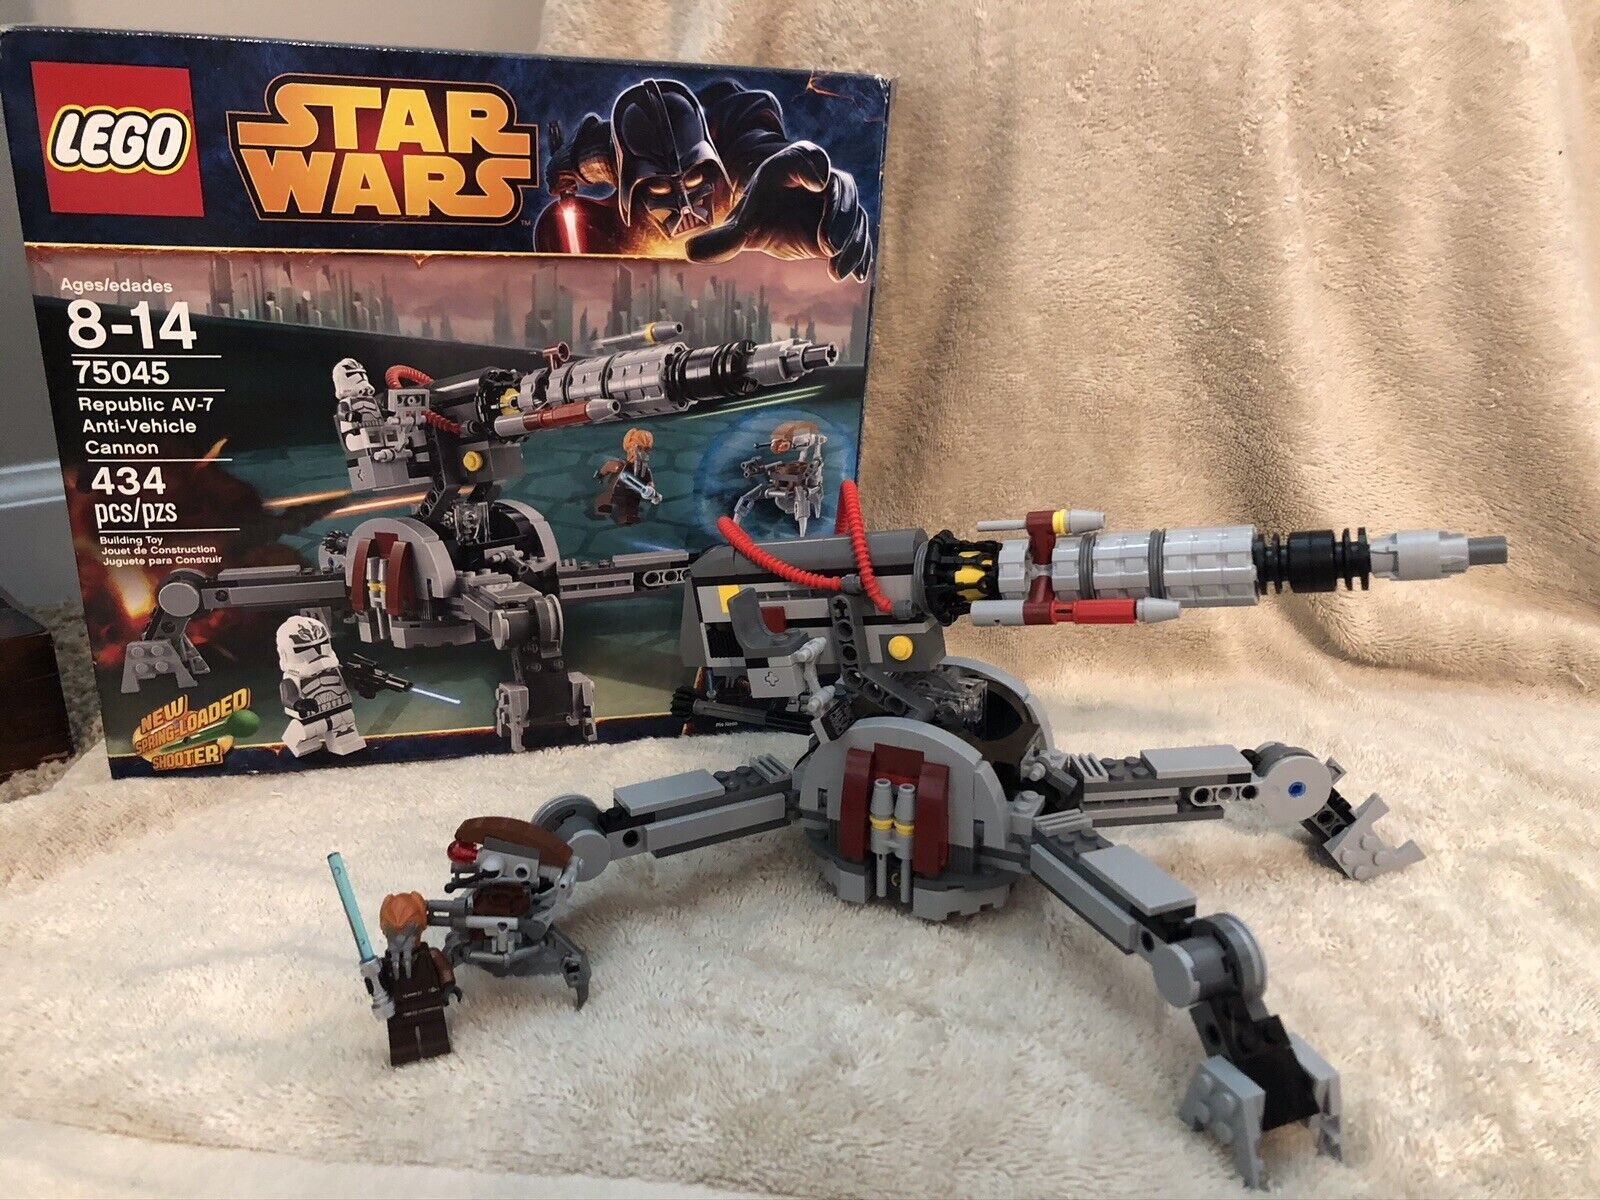 Av-7 anti-vehicle Cannon ™ Star Wars ™ set 75045//Wolf Pack Clone Trooper!